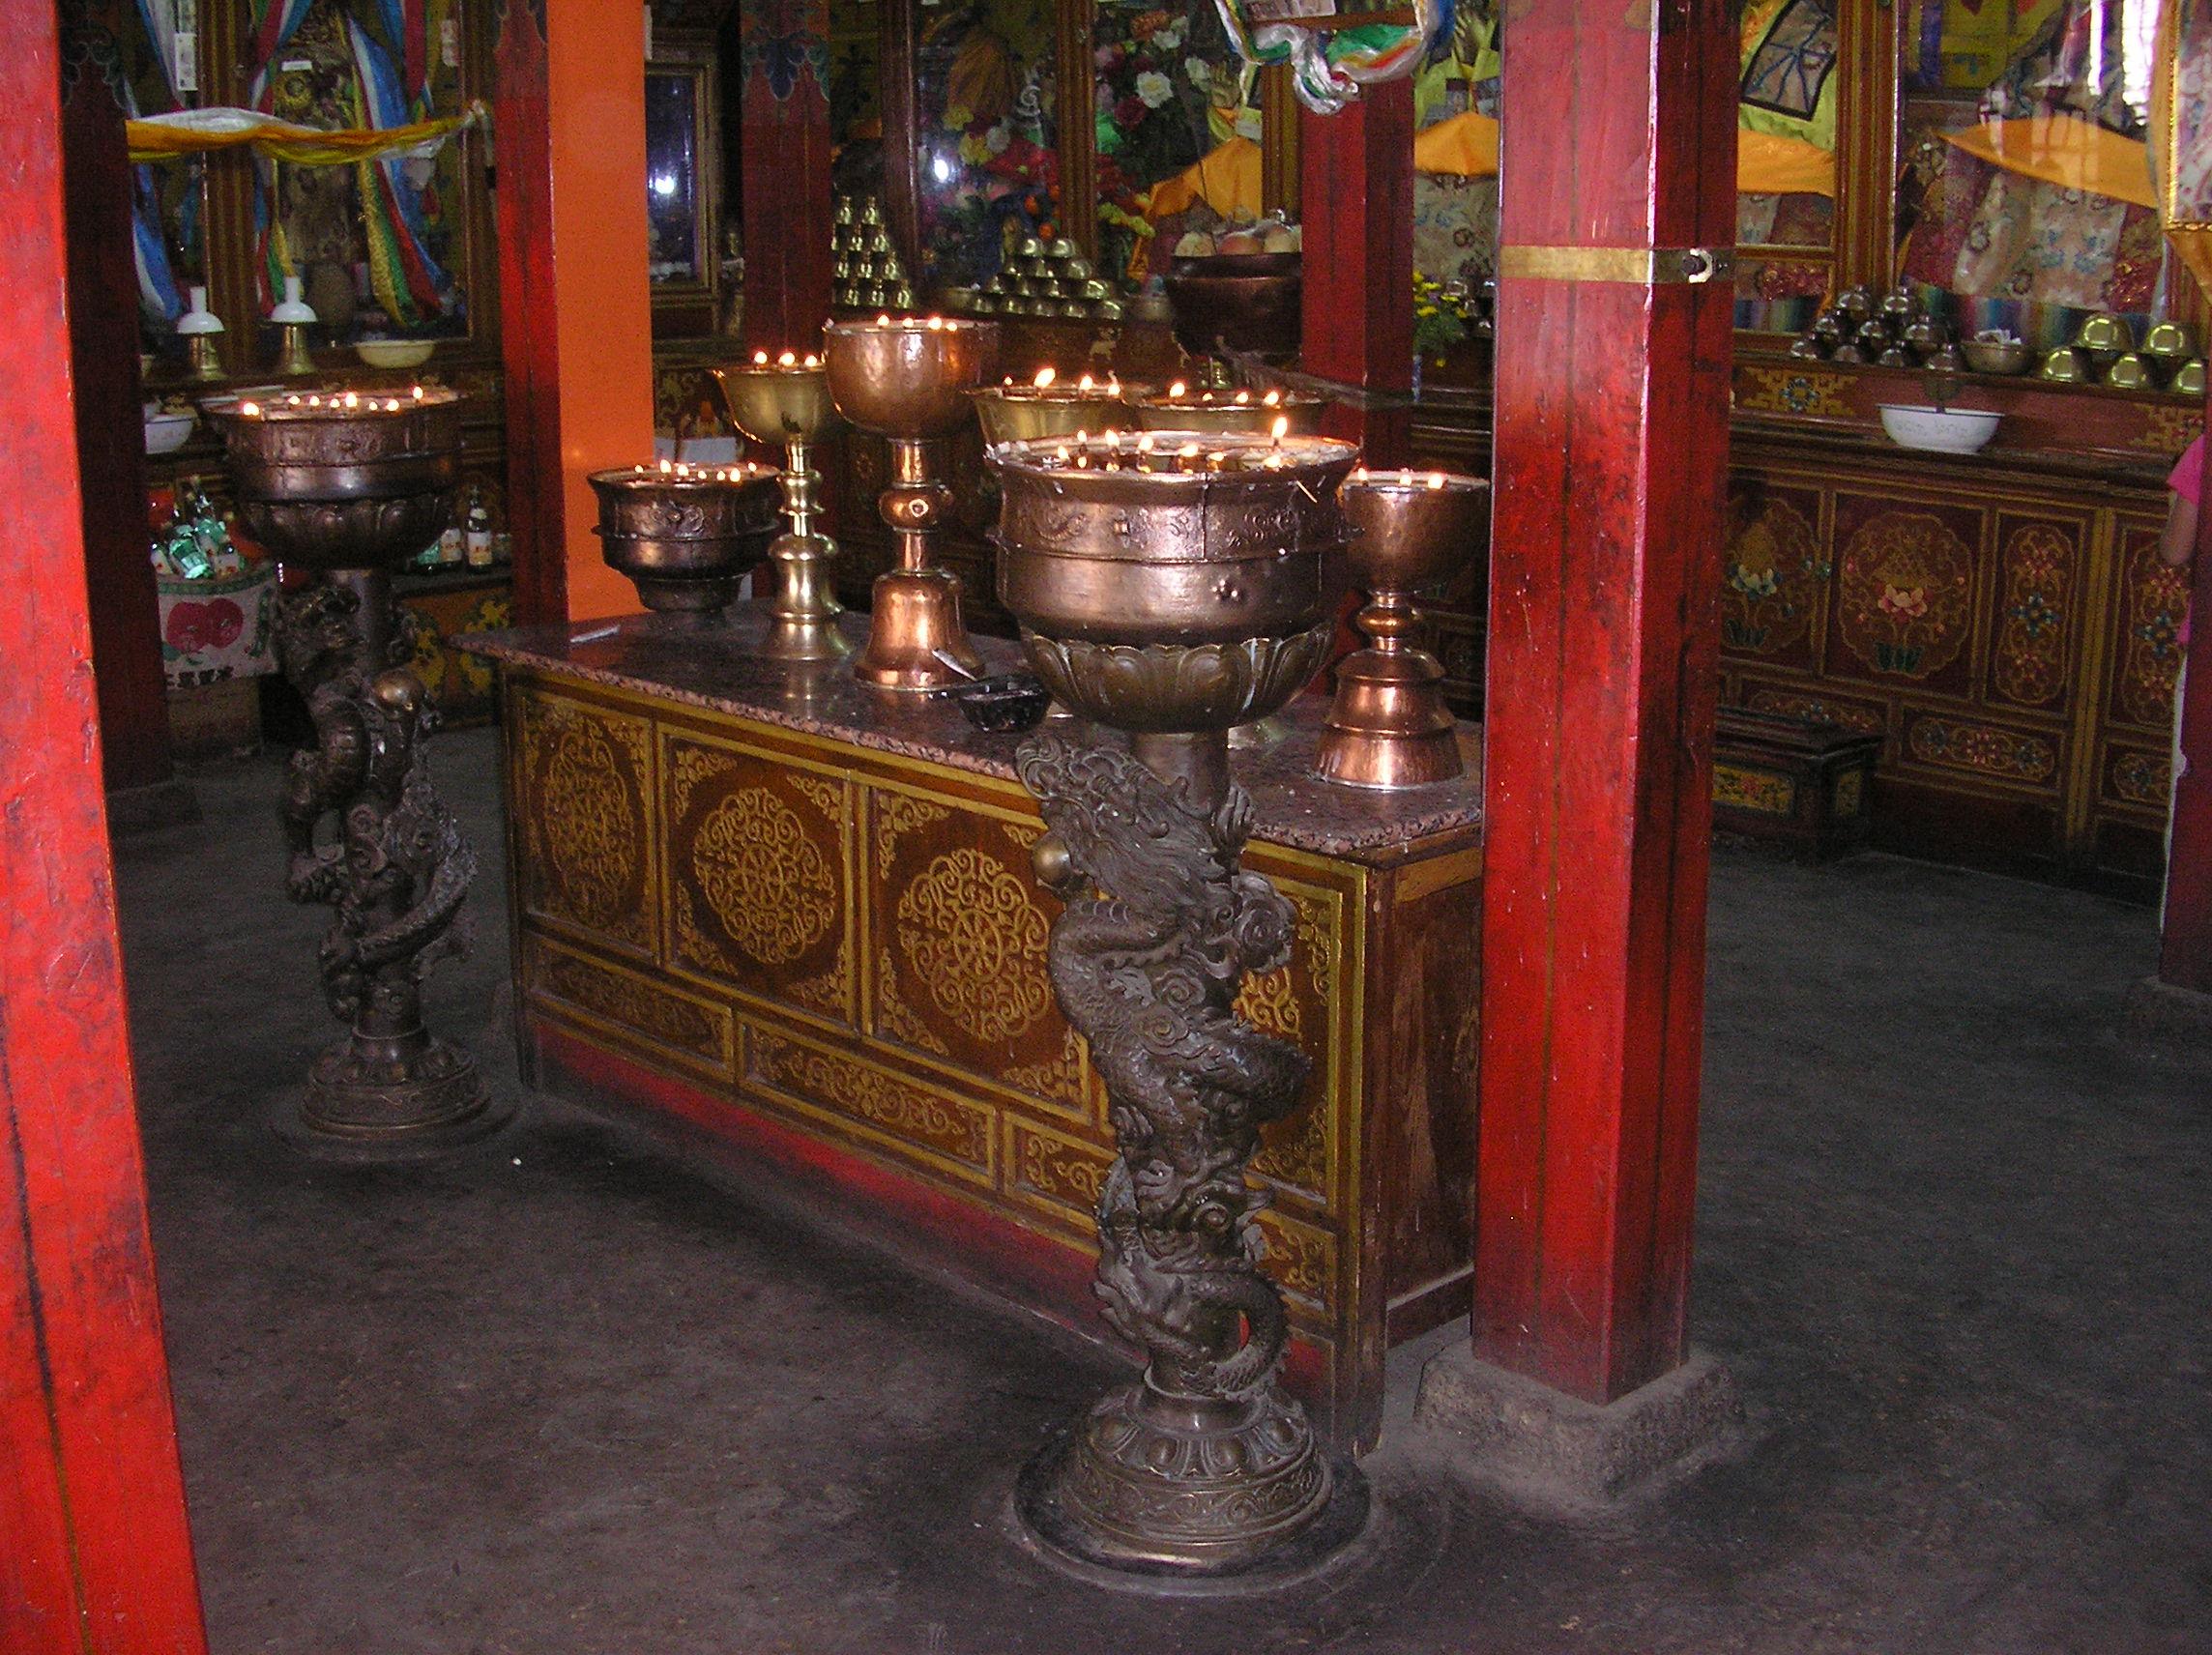 Mobili Cinesi Usati : Latitudini mobili le tipologie dei mobili tibetani